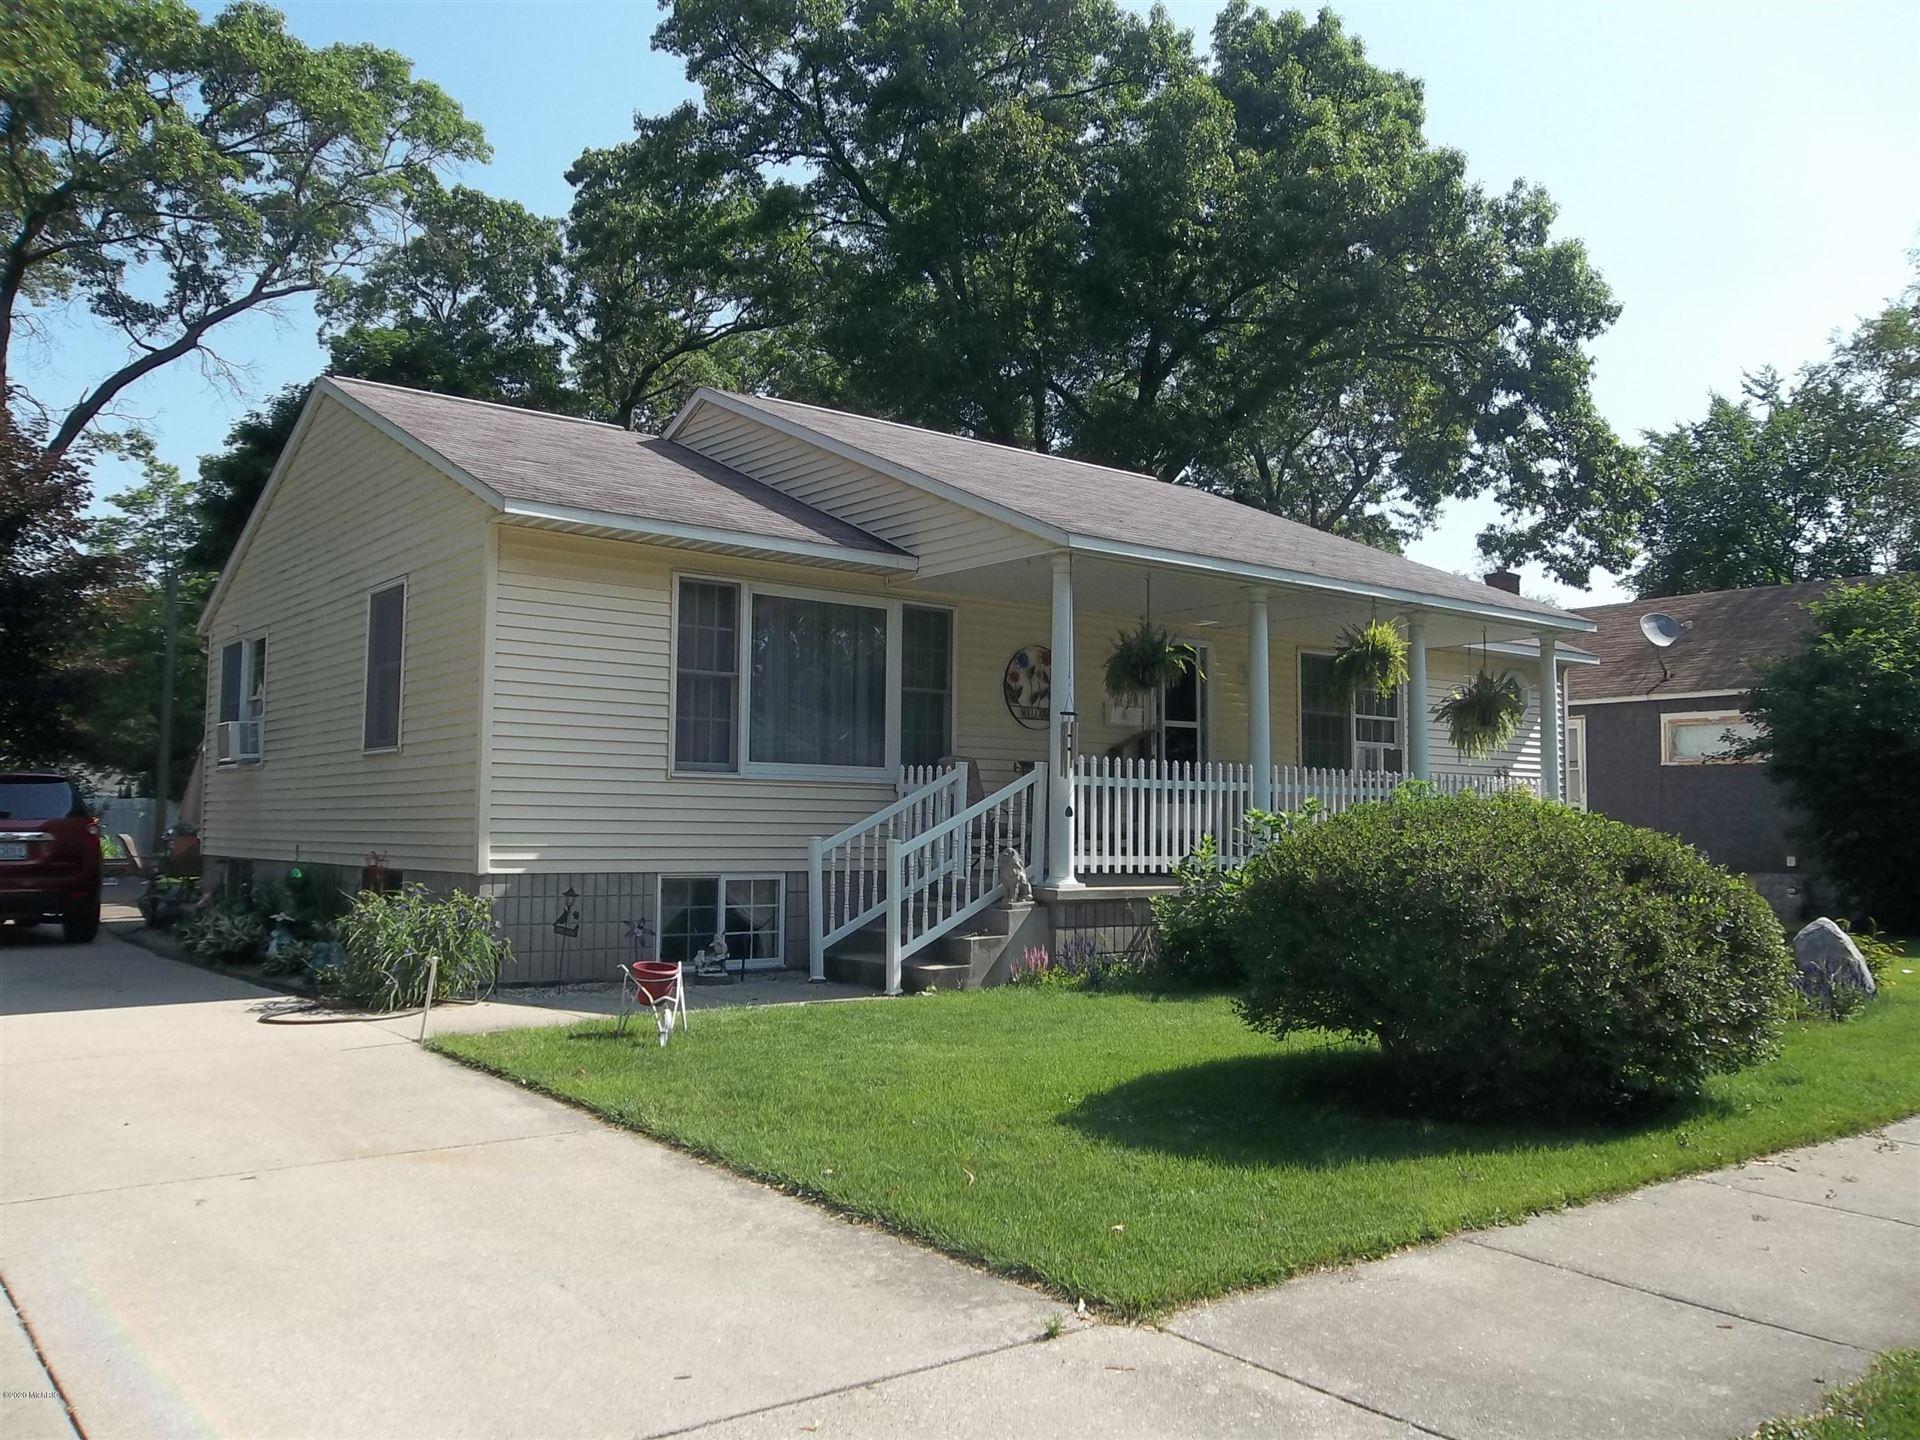 Photo of 1088 Calvin Avenue, Muskegon, MI 49442 (MLS # 20024658)